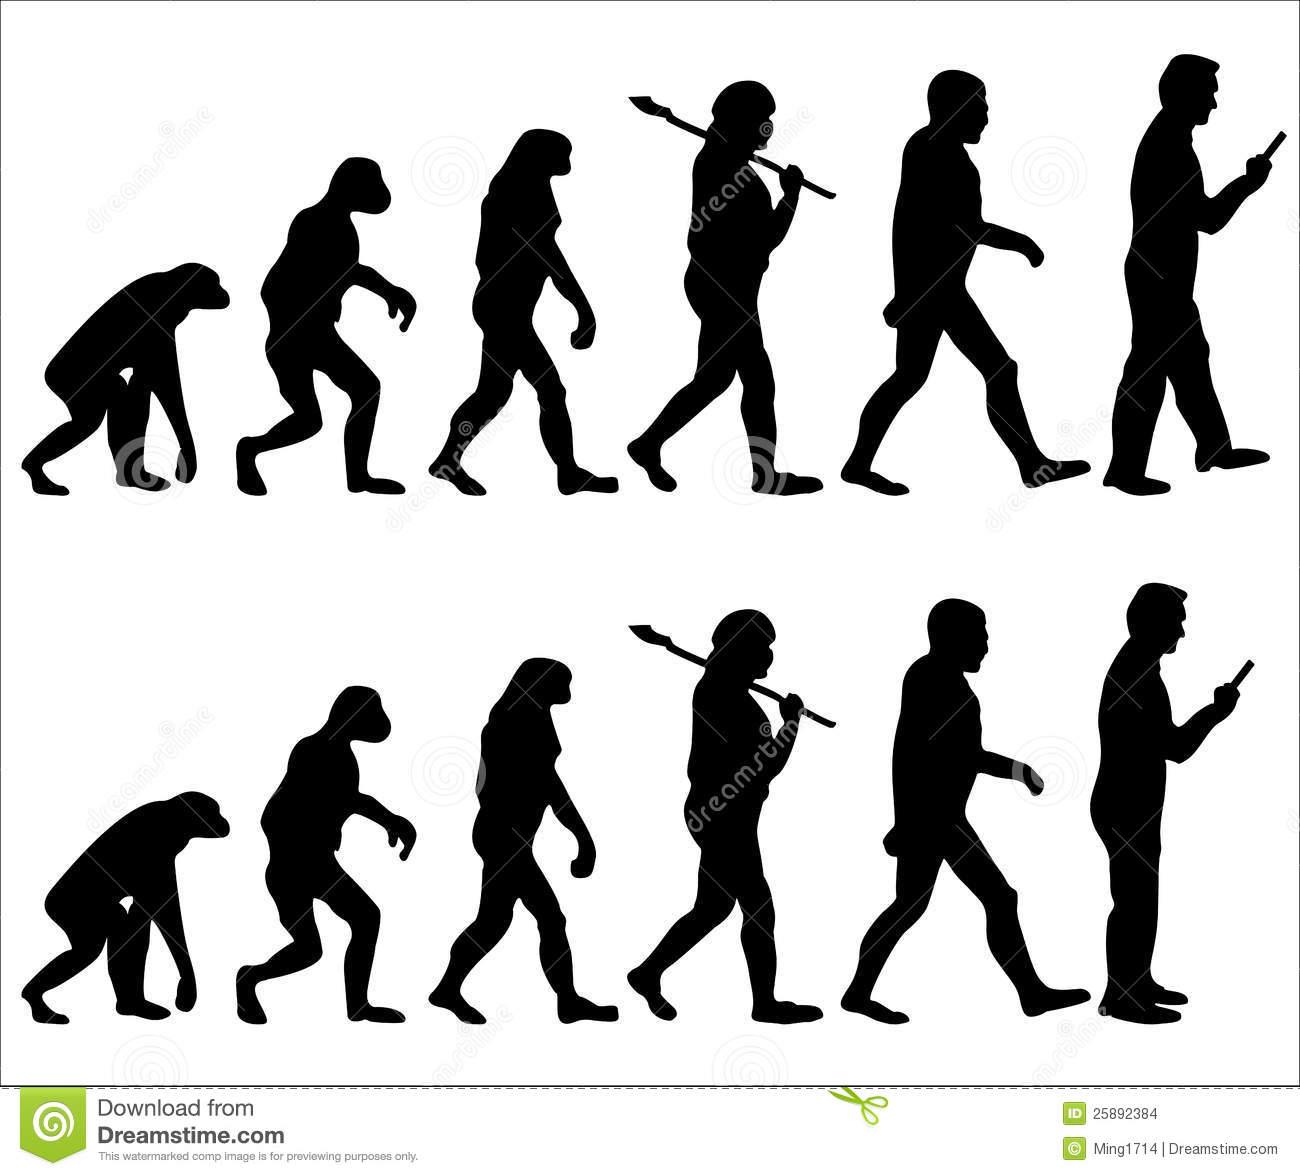 Evolution of man clipart.